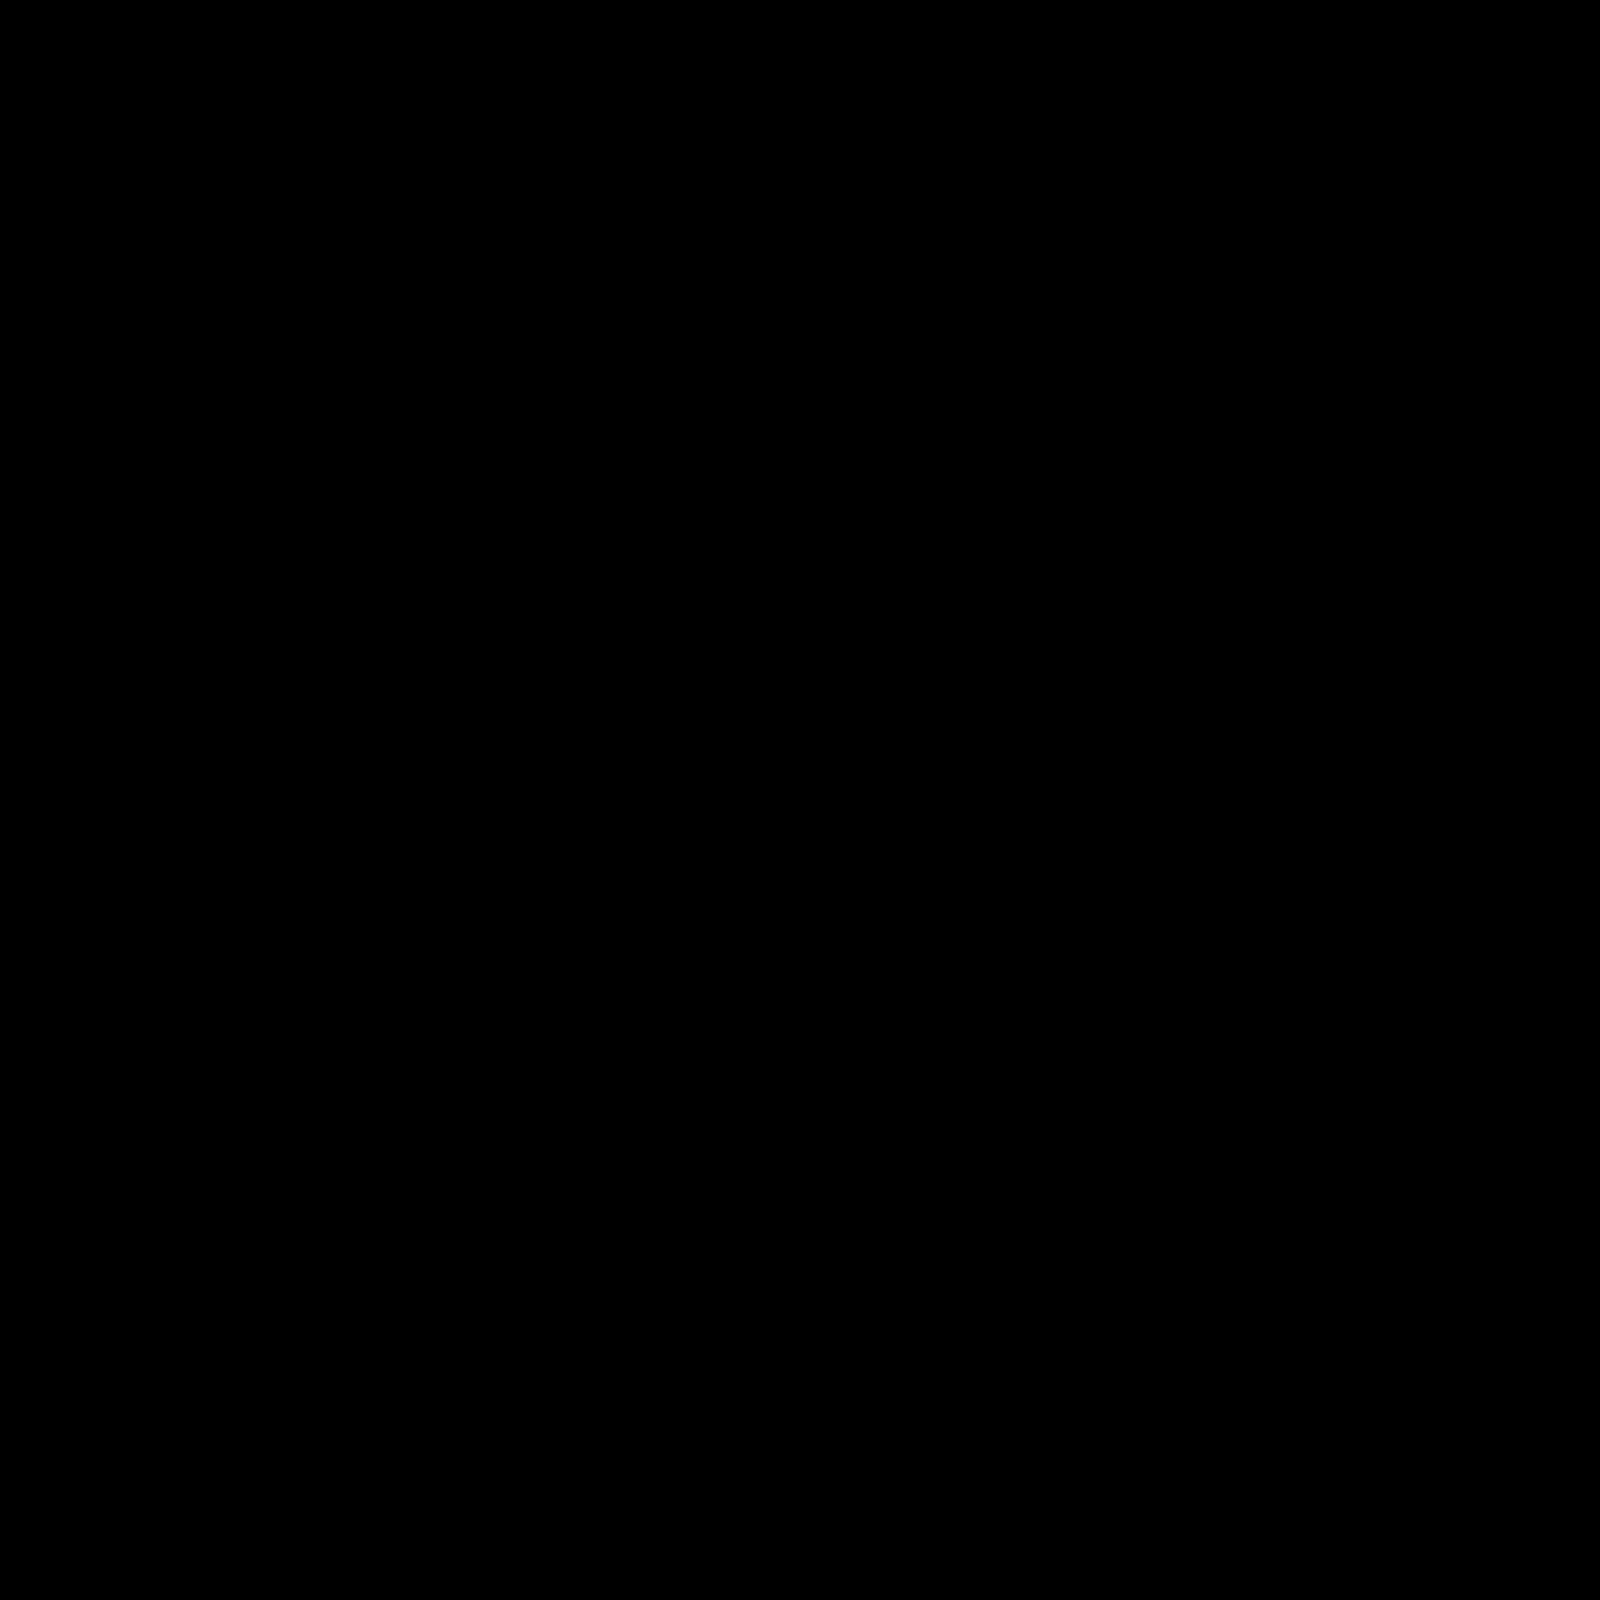 Spadochroniarstwo icon